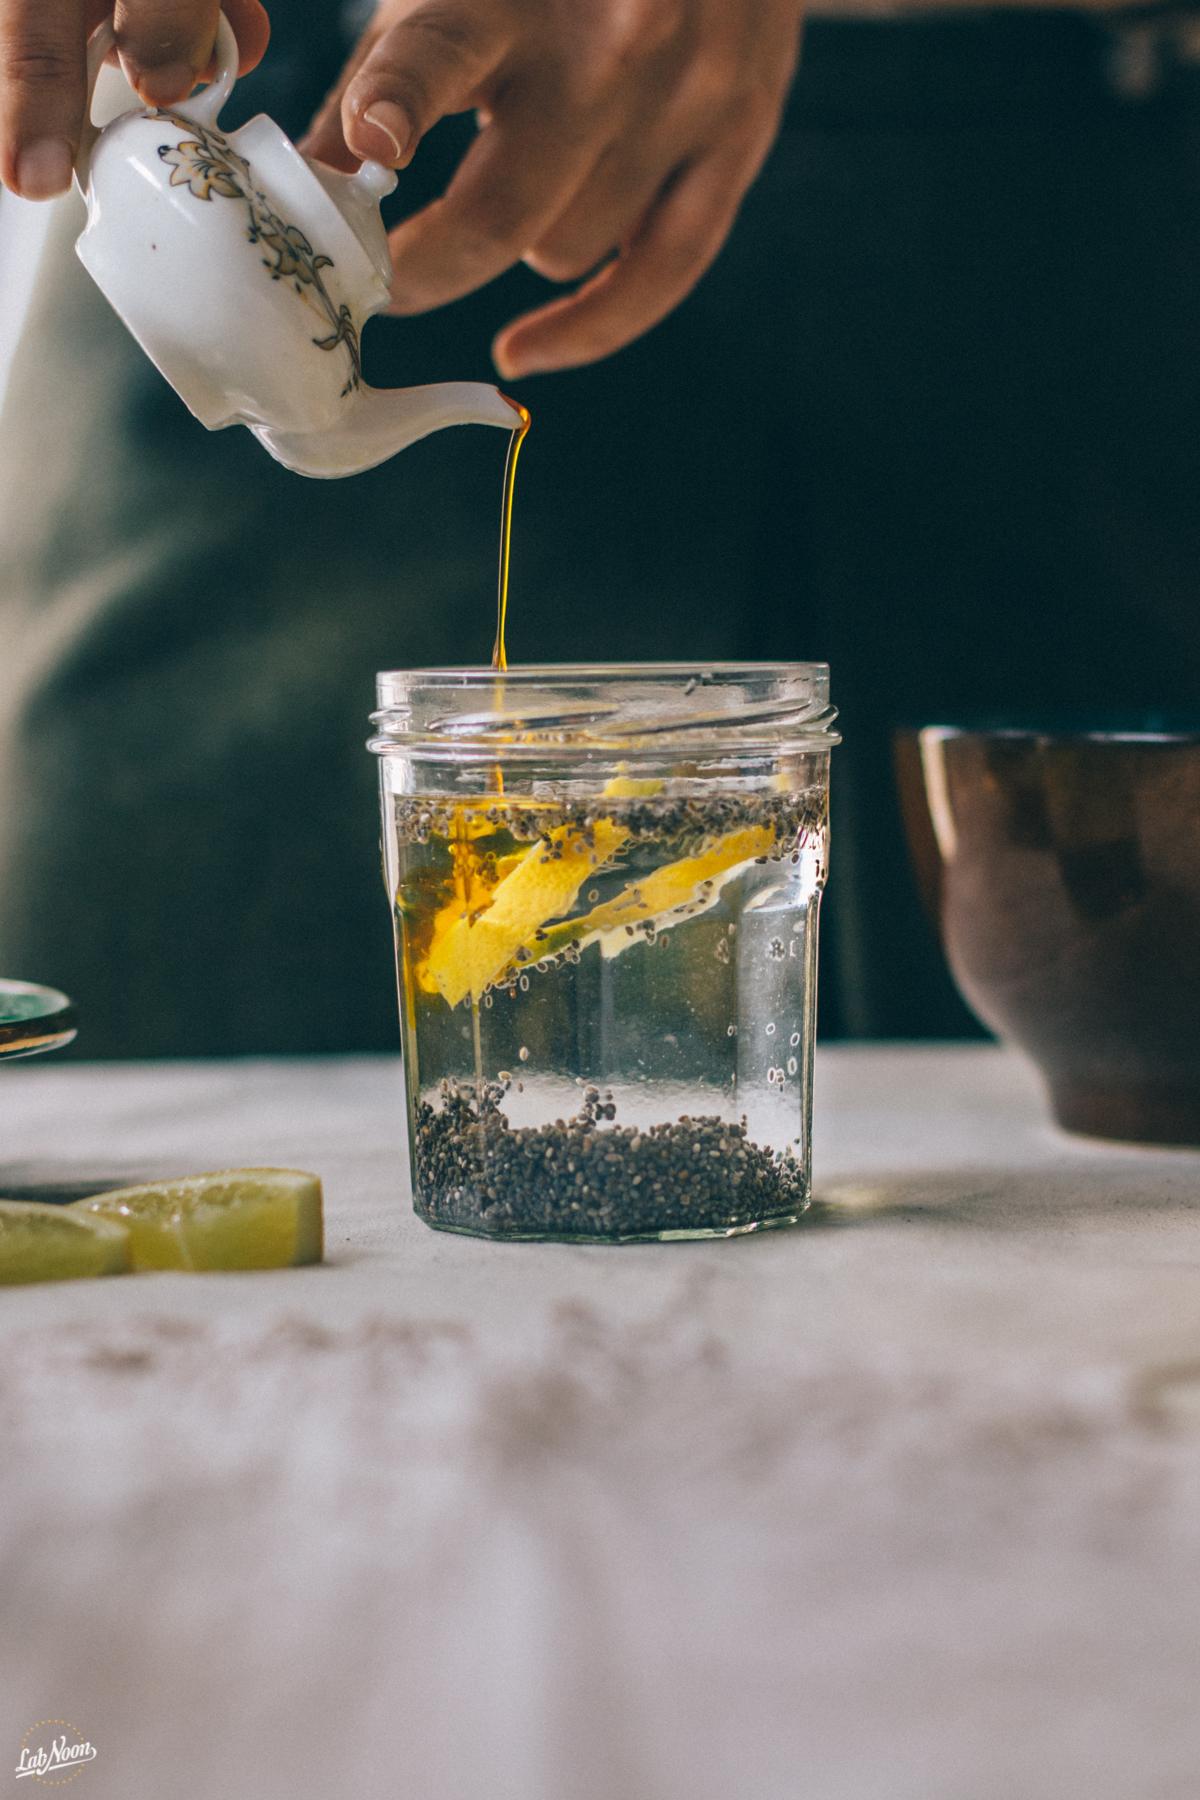 Persian Chia Seeds Drink for Nowruz | Bevanda di Semi di Chia alla Persiana per Nowruz | Lab Noon #PFBNowruz-18